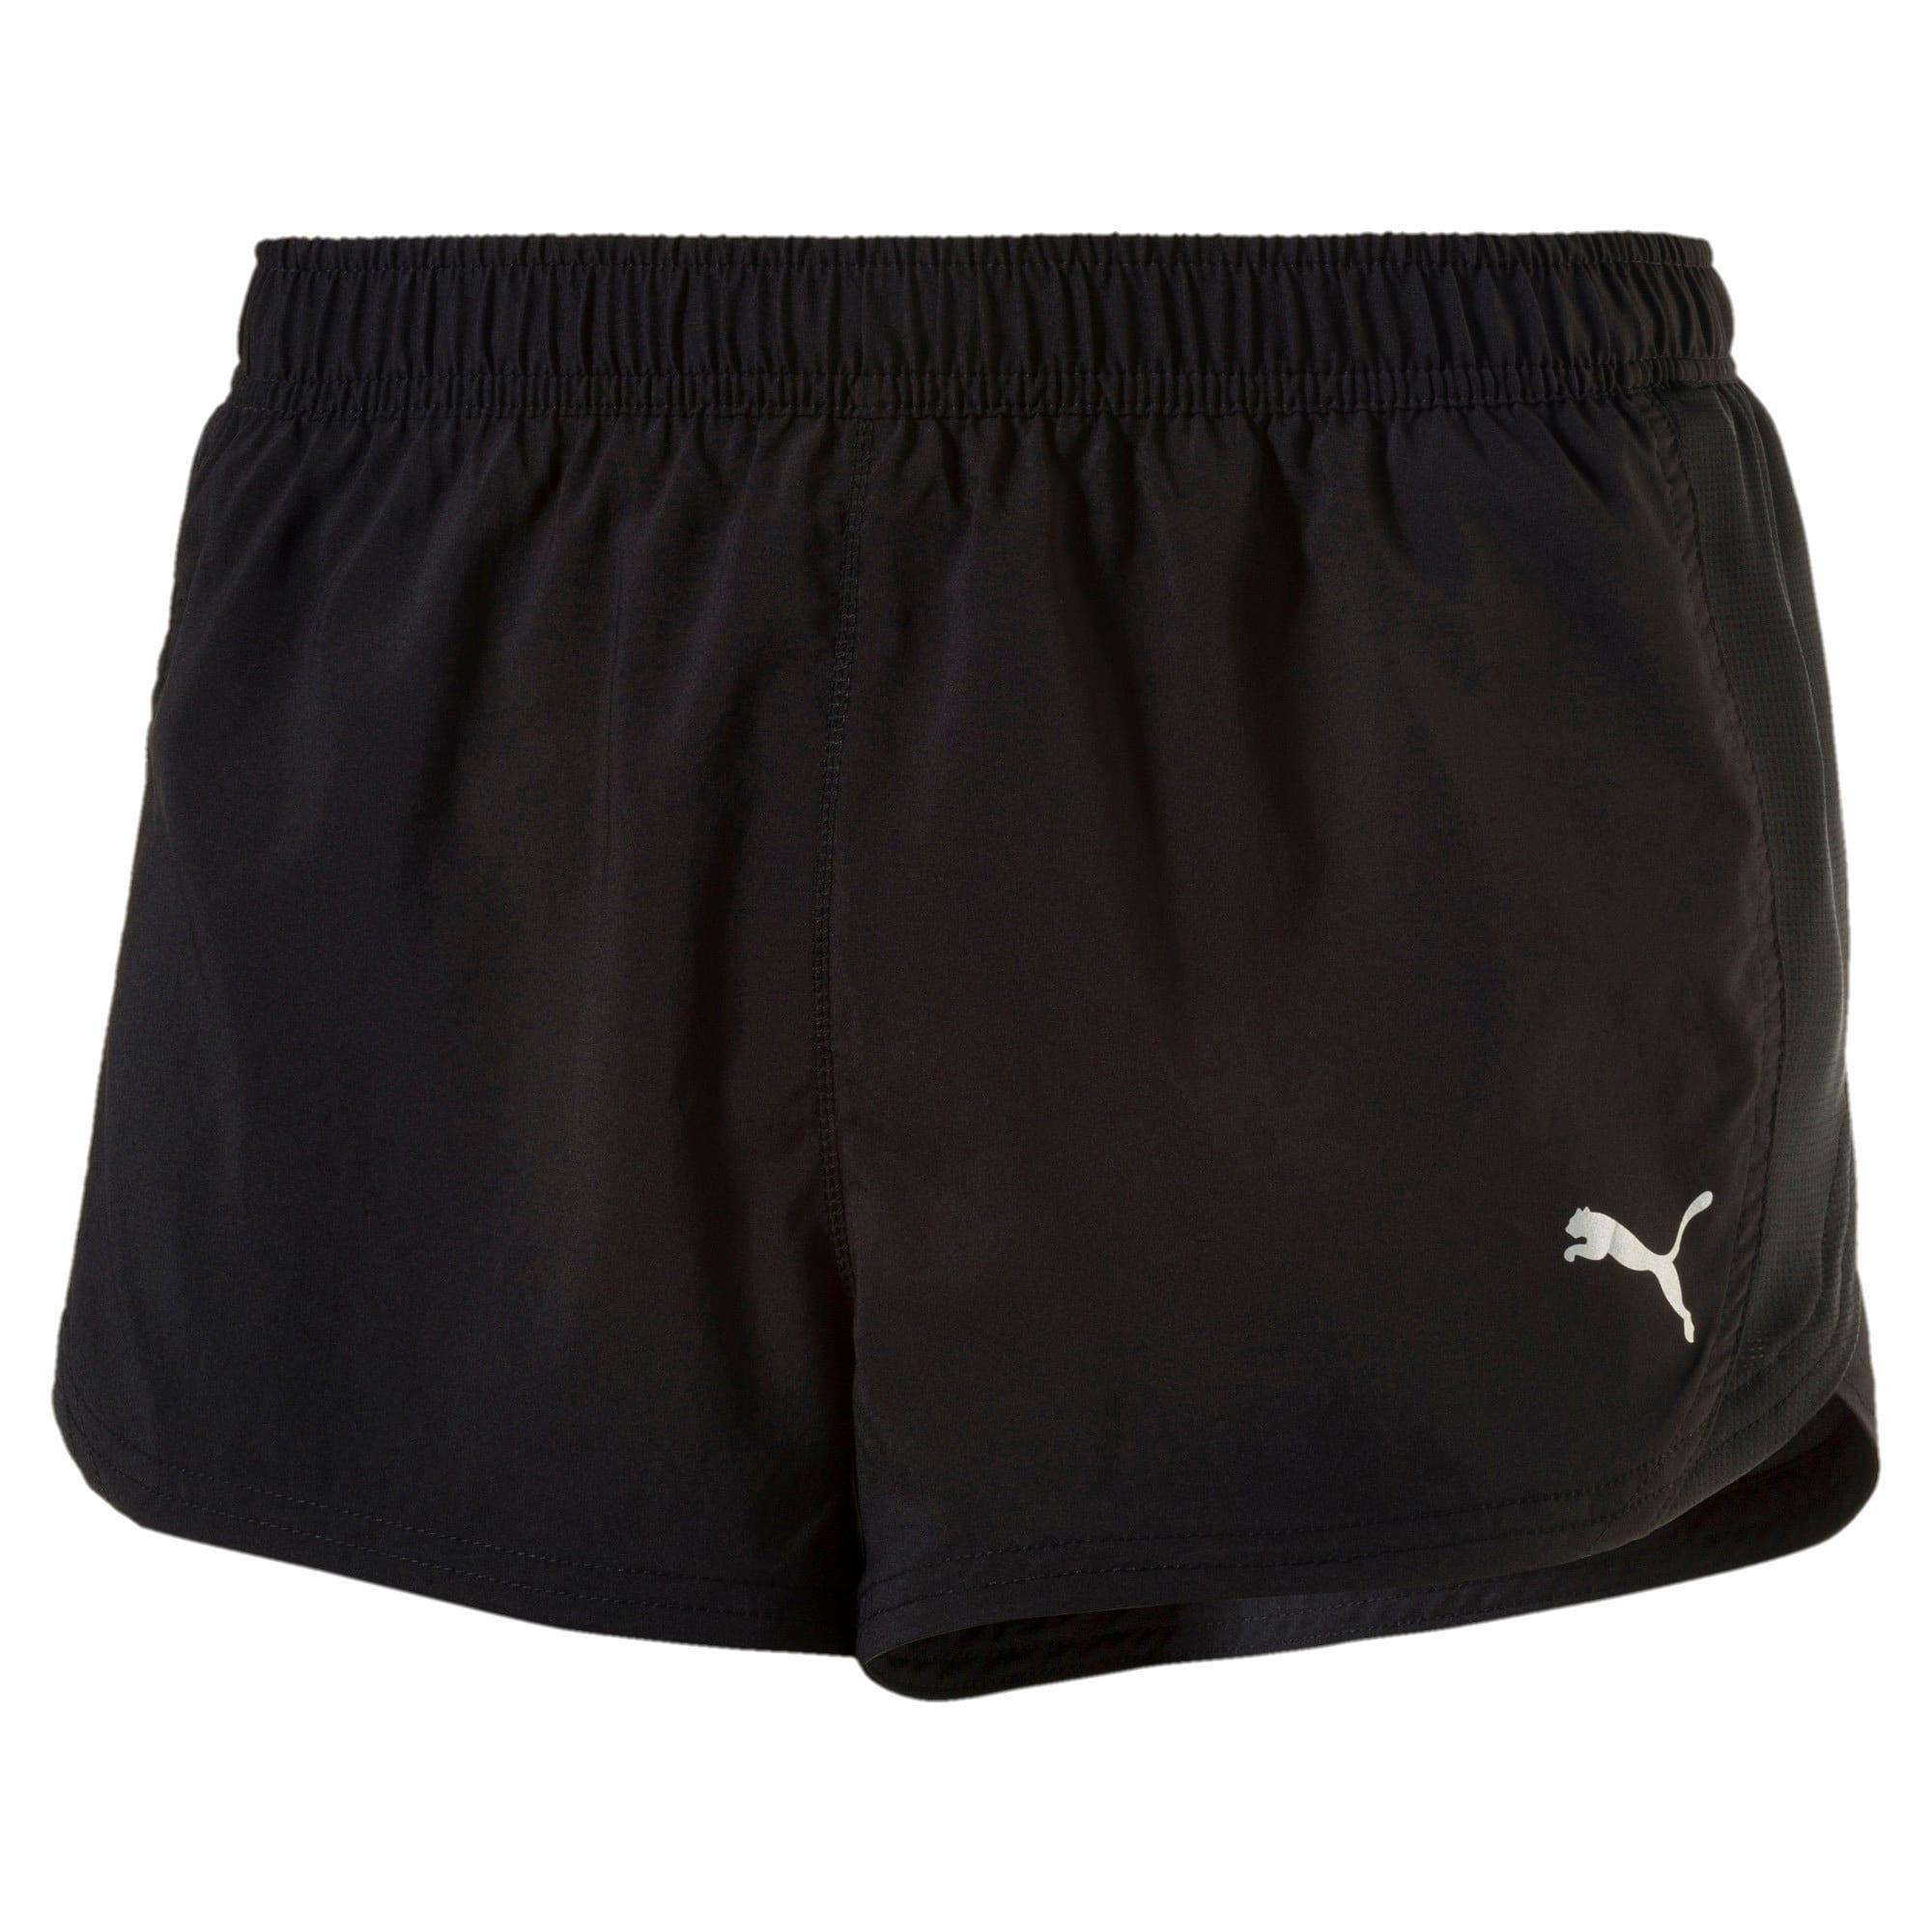 Thumbnail 4 of Running Men's Split Shorts, Puma Black, medium-IND